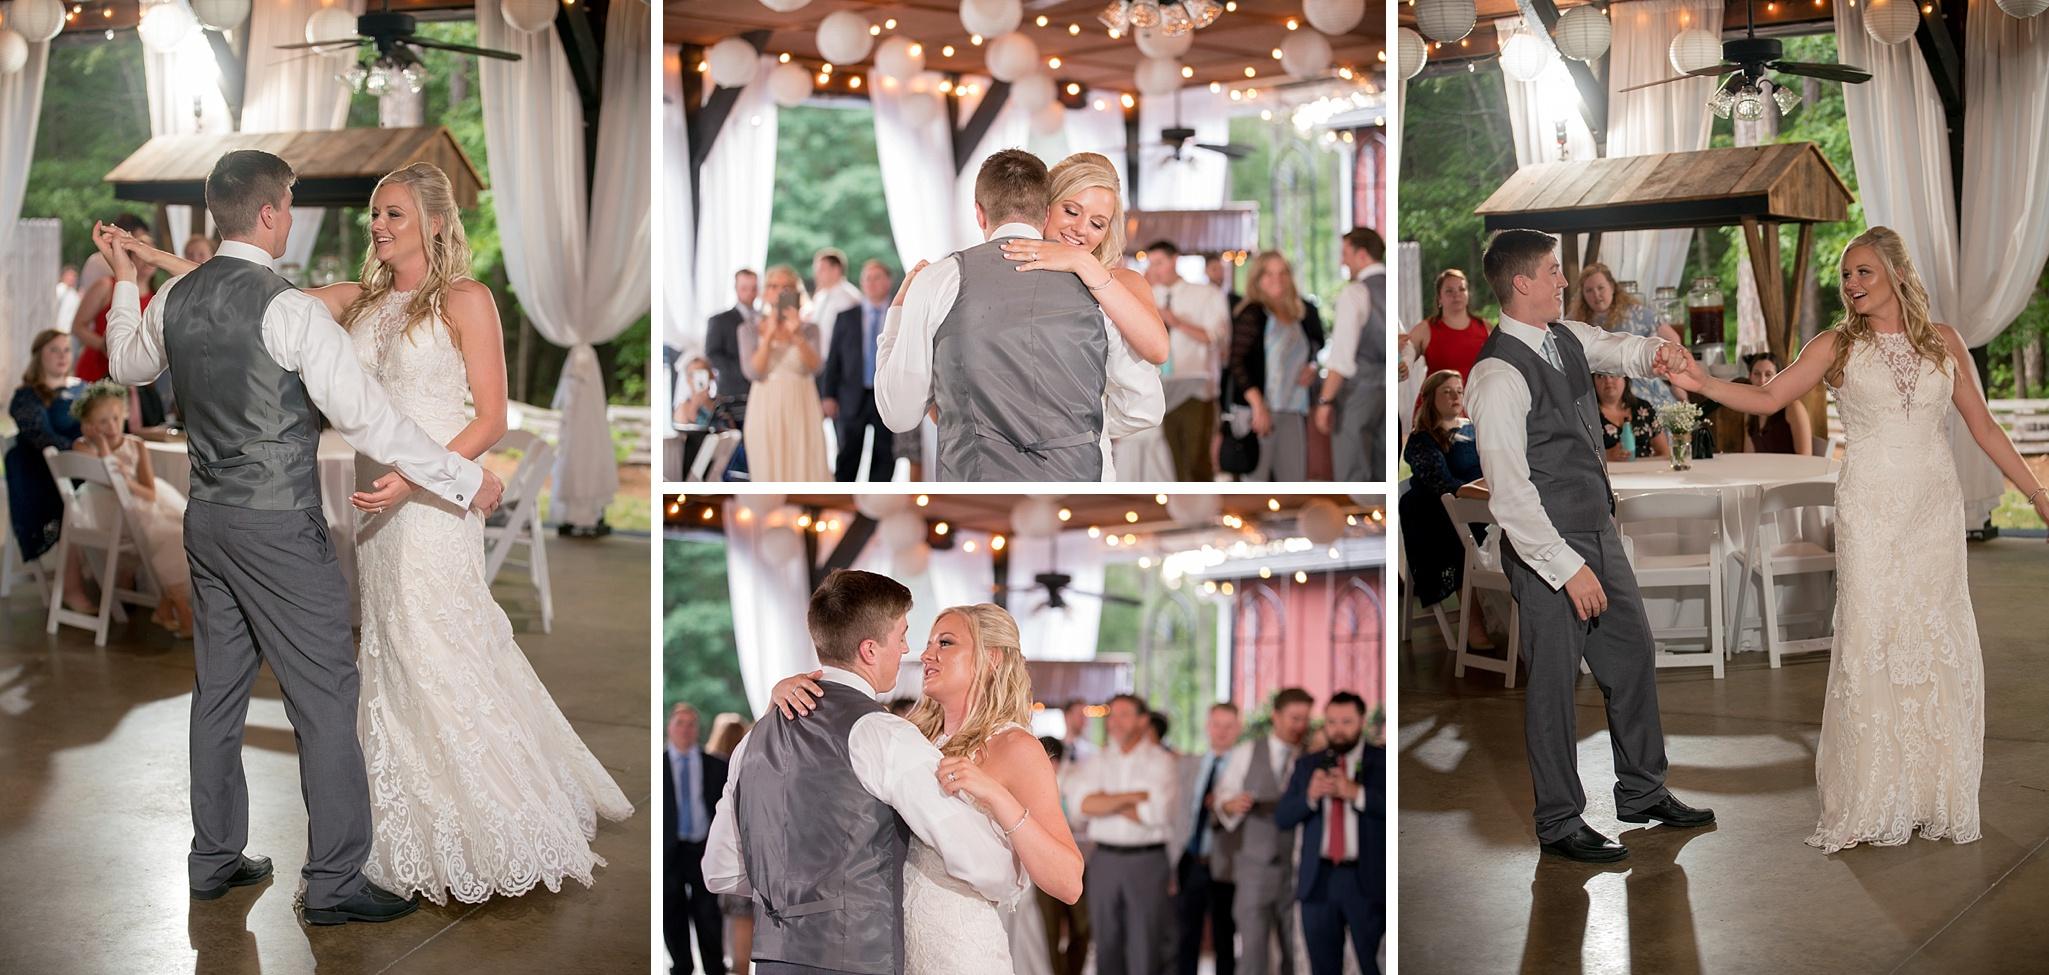 Shady-Wagon-Farm-NC-Wedding-Photographer-0193.jpg